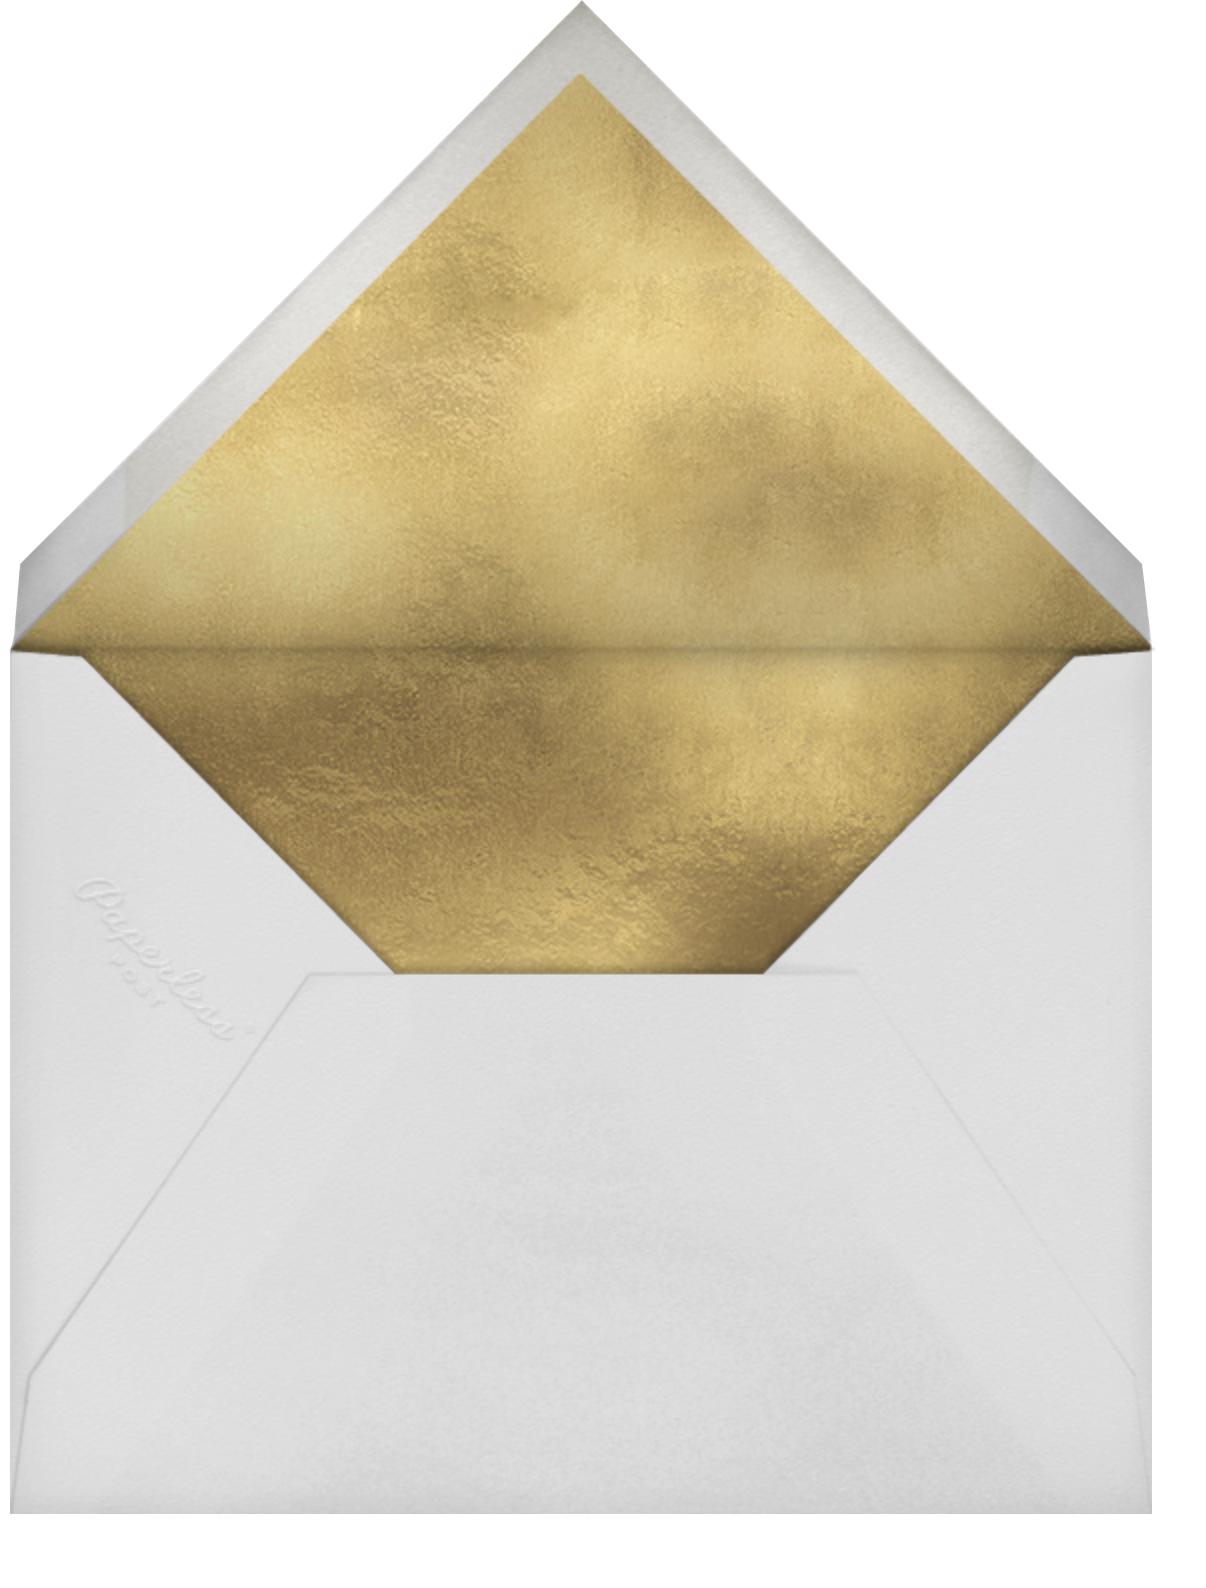 Avalon - Macaron - Kelly Wearstler - Lunar New Year - envelope back